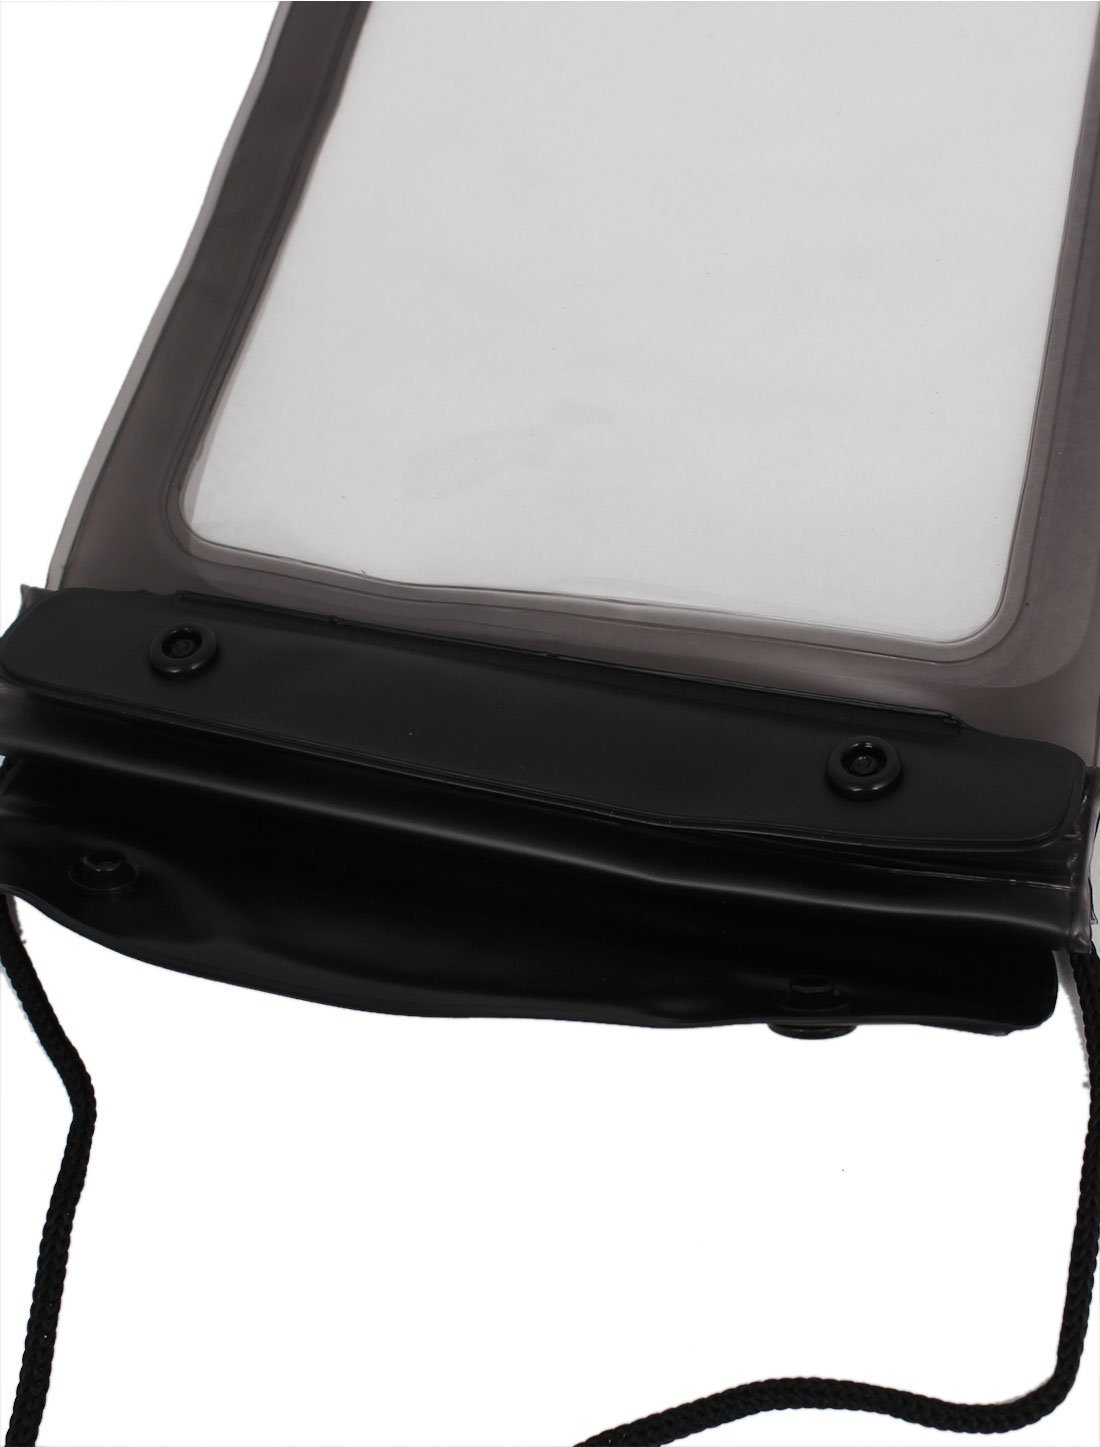 Amazon.com: eDealMax Carcasa estanca Bolsa impermeable cubierta del bolso gris de la tableta DE 7.7 pulgadas: Electronics